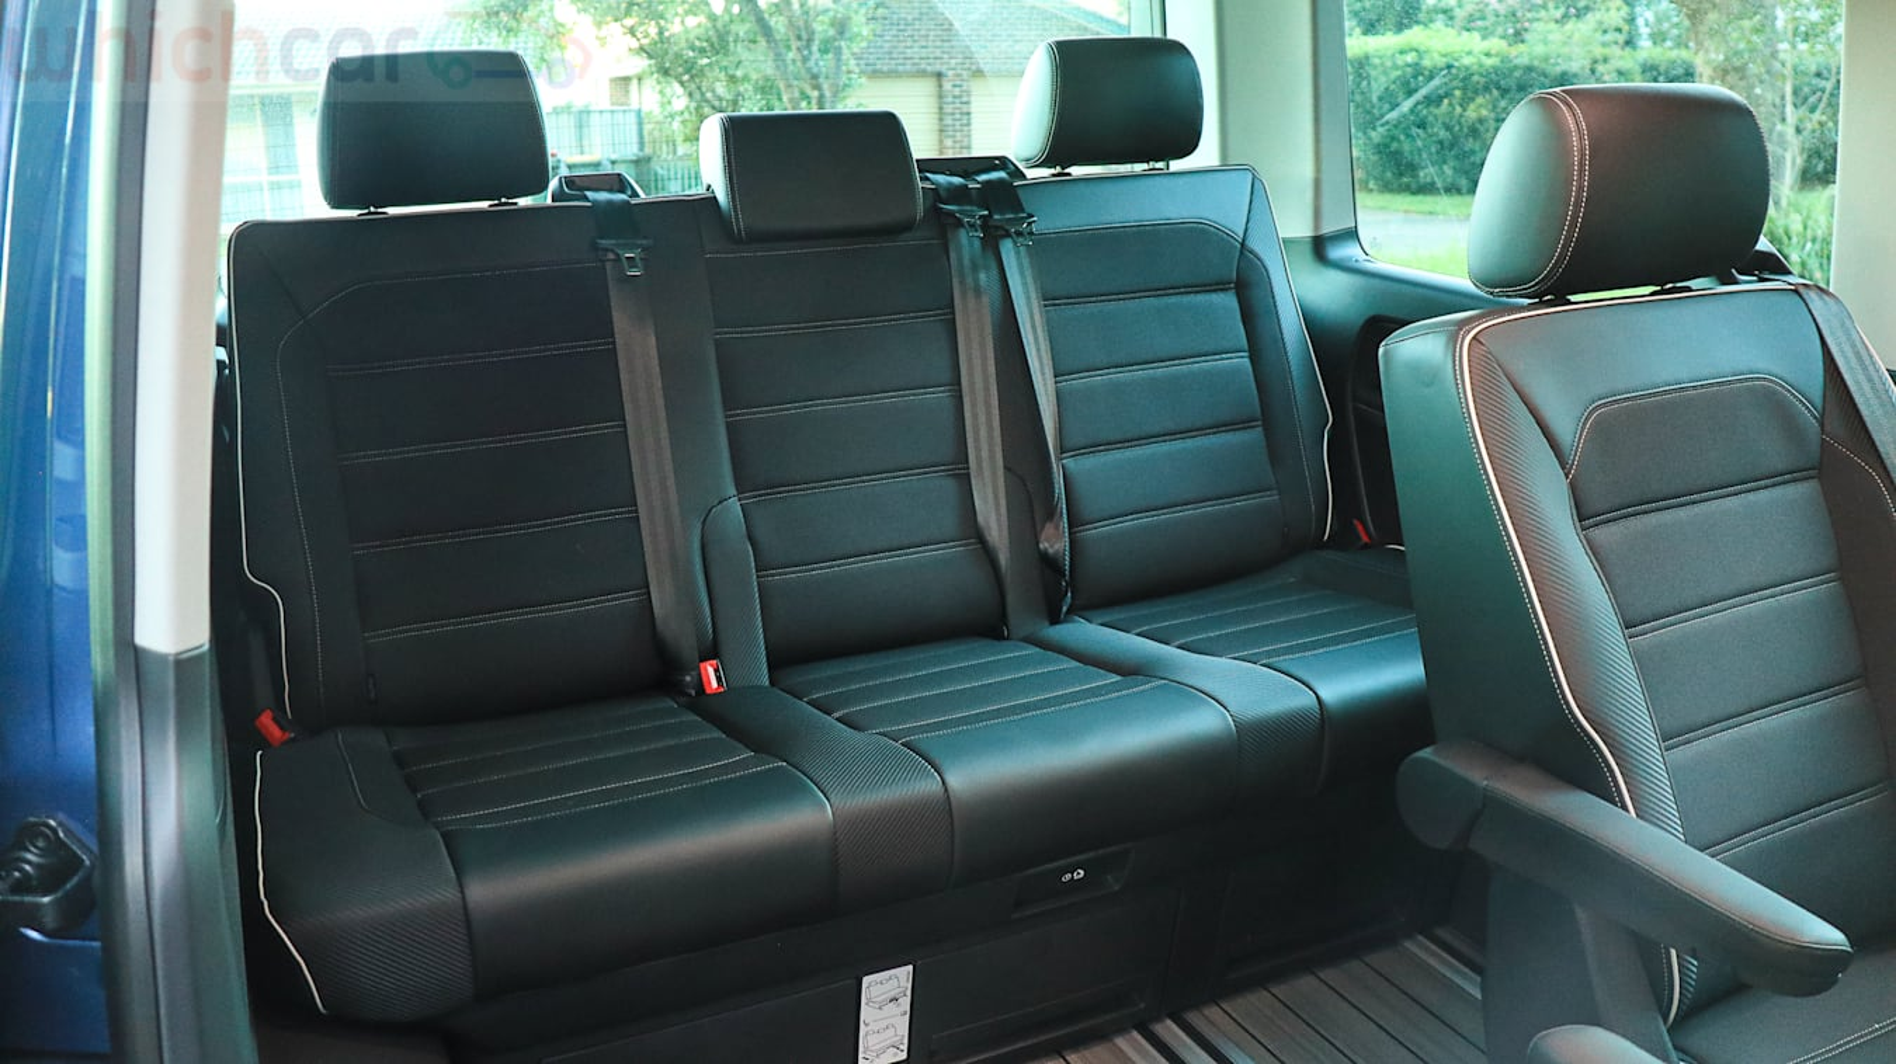 Volkswagen Multivan Black Edition 2019 15 Jpg